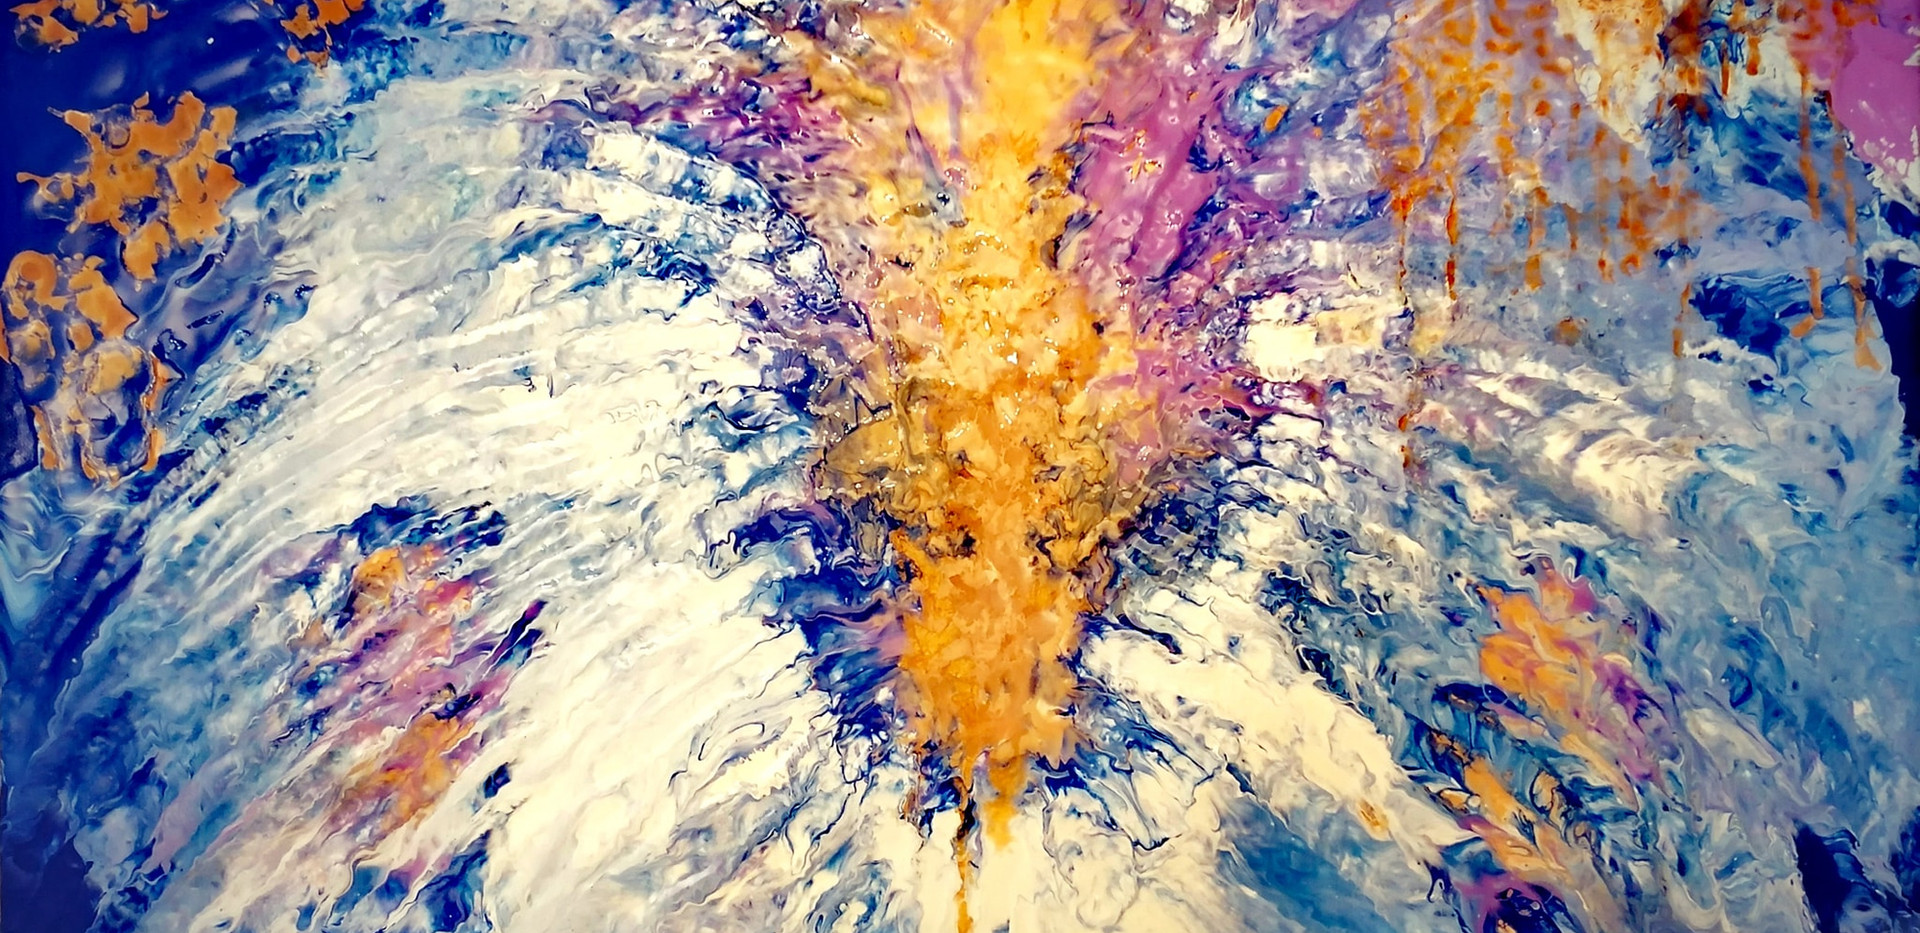 Matrix erupting